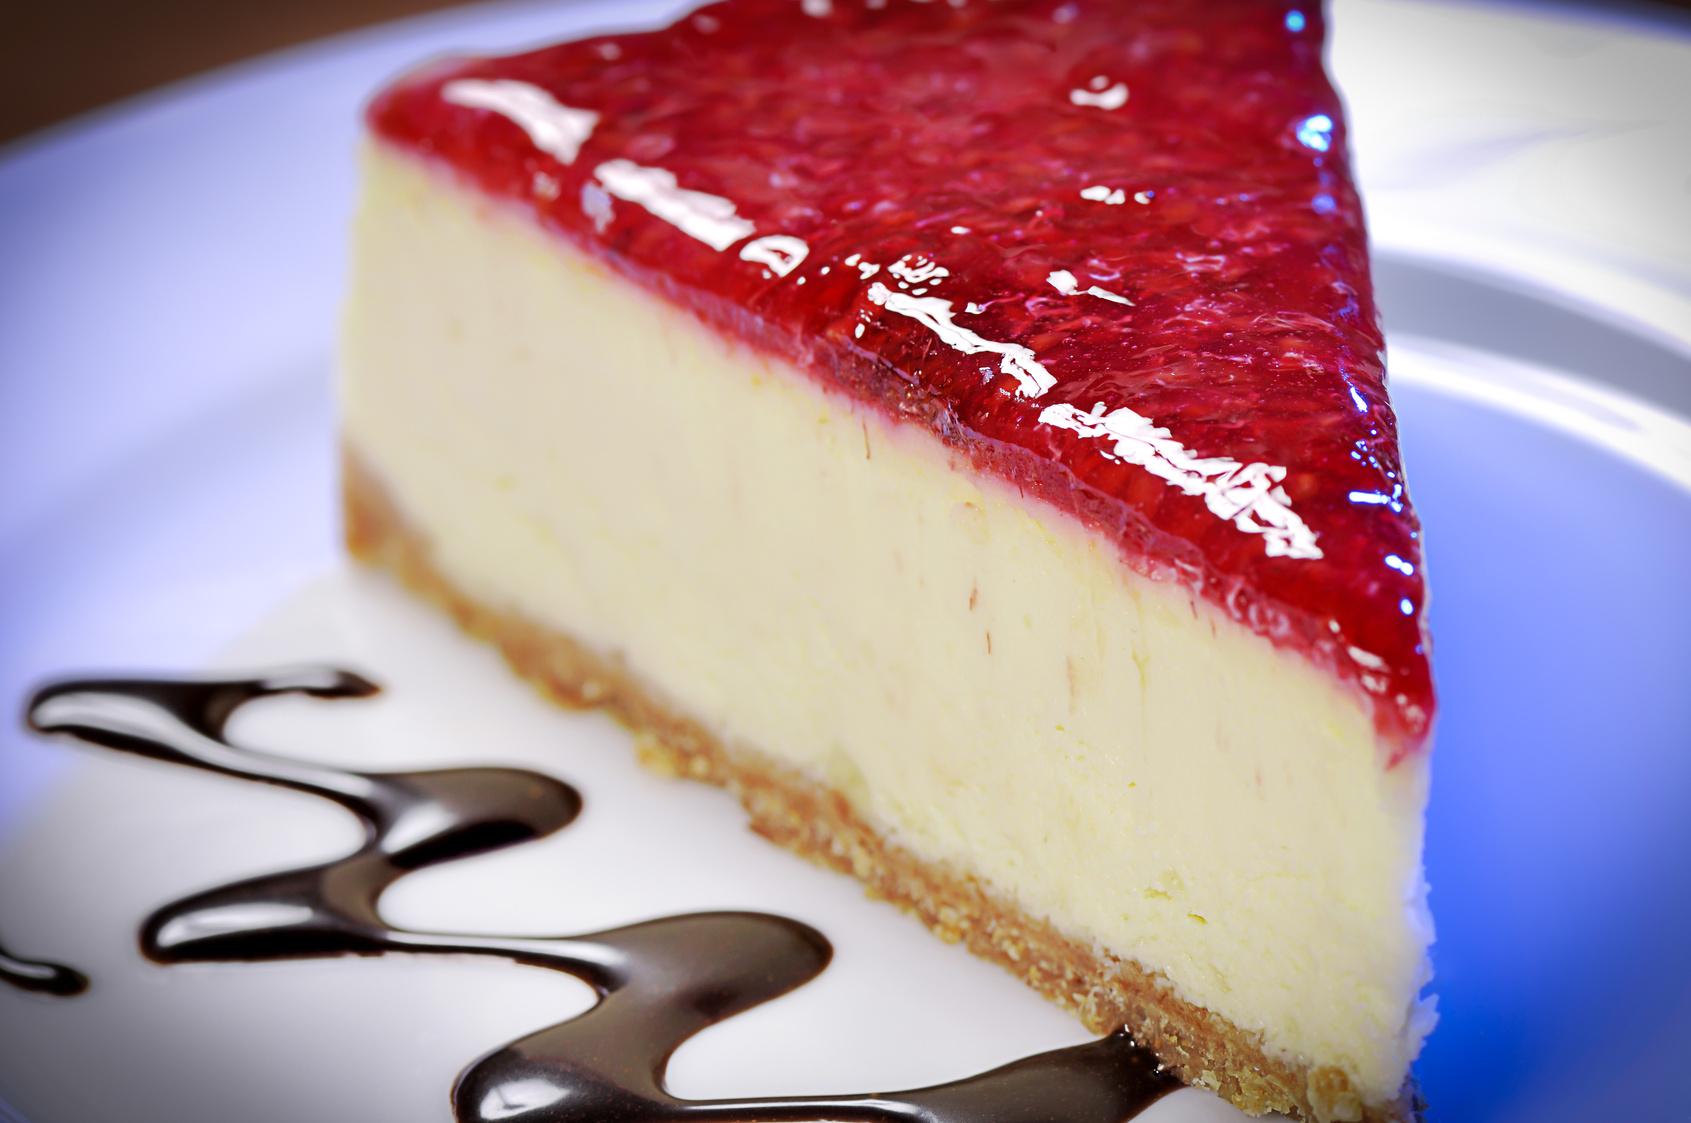 Favoritos Sobremesas Fitness: 2 ideias saborosas JE93